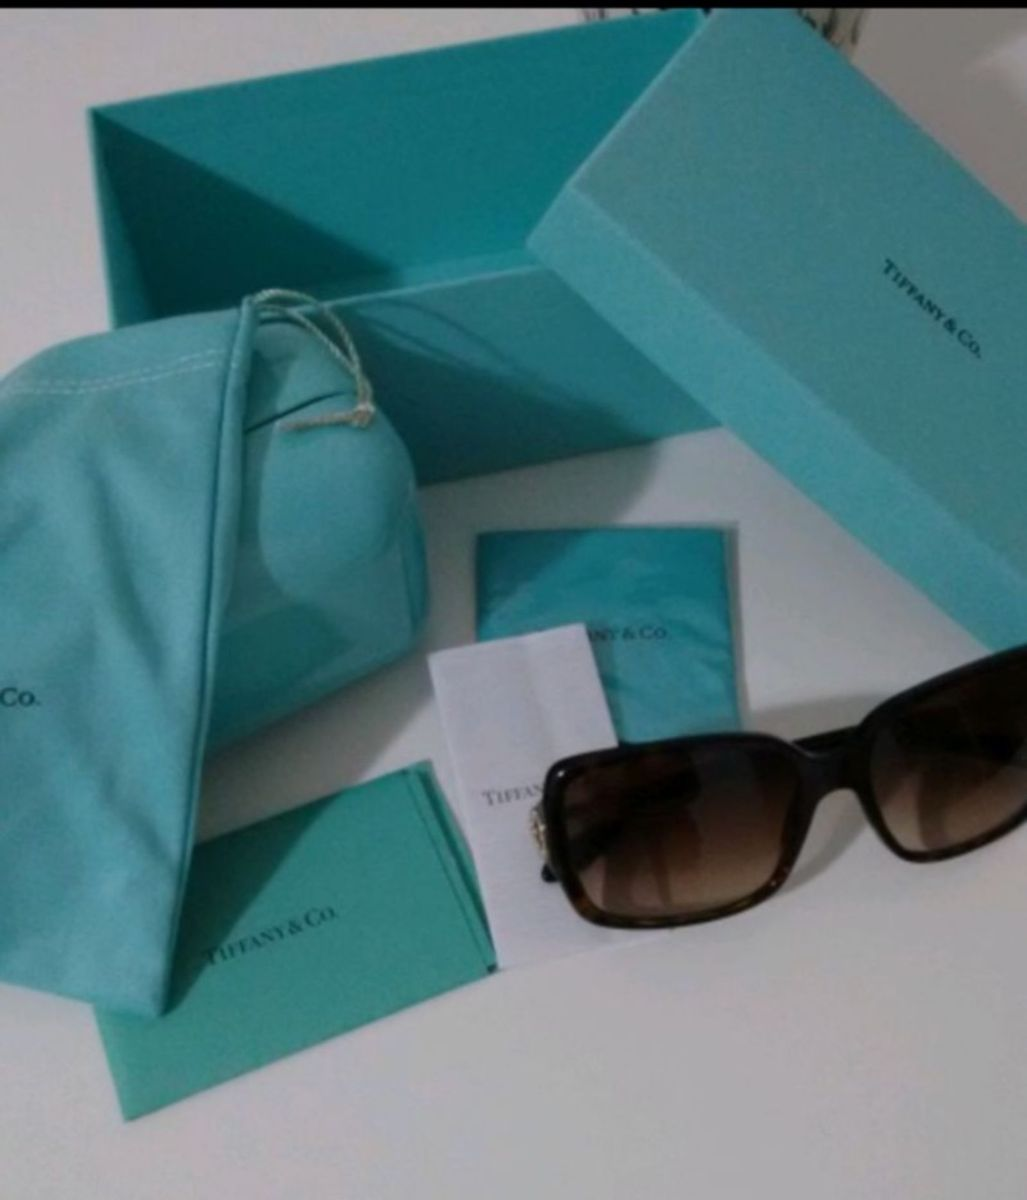 818e7f0c30fec óculos de sol tiffany - óculos tiffany.  Czm6ly9wag90b3muzw5qb2vplmnvbs5ici9wcm9kdwn0cy80nzc4ote5lzfhzgmzodkyntzkmtiwnzzhn2zhmdg1nje5ytm4mgu4lmpwzw  ...